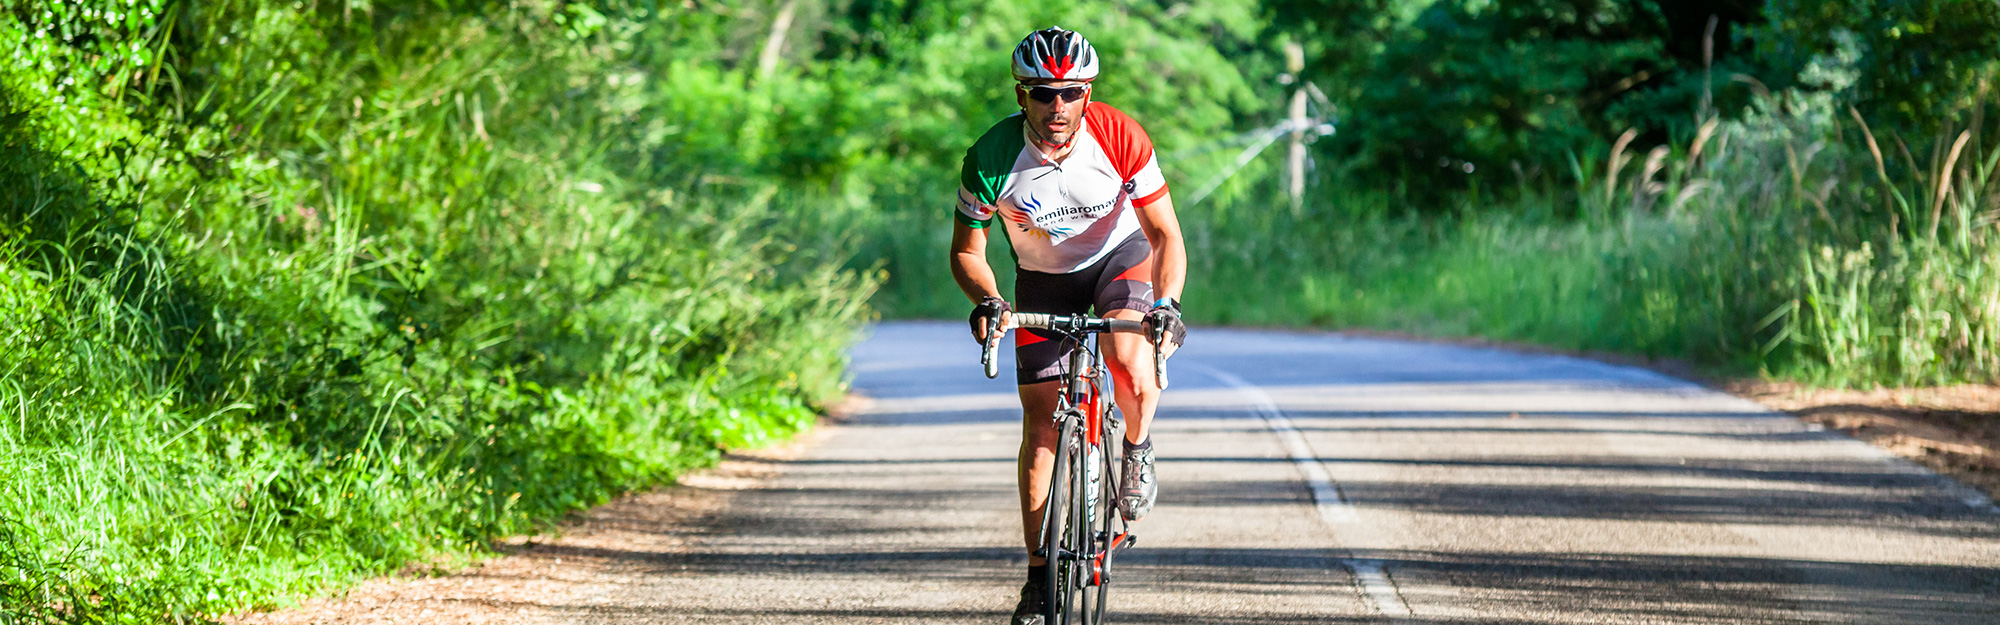 Bagno di Romagna | Destinations for Cyclists in Emilia Romagna, Italy